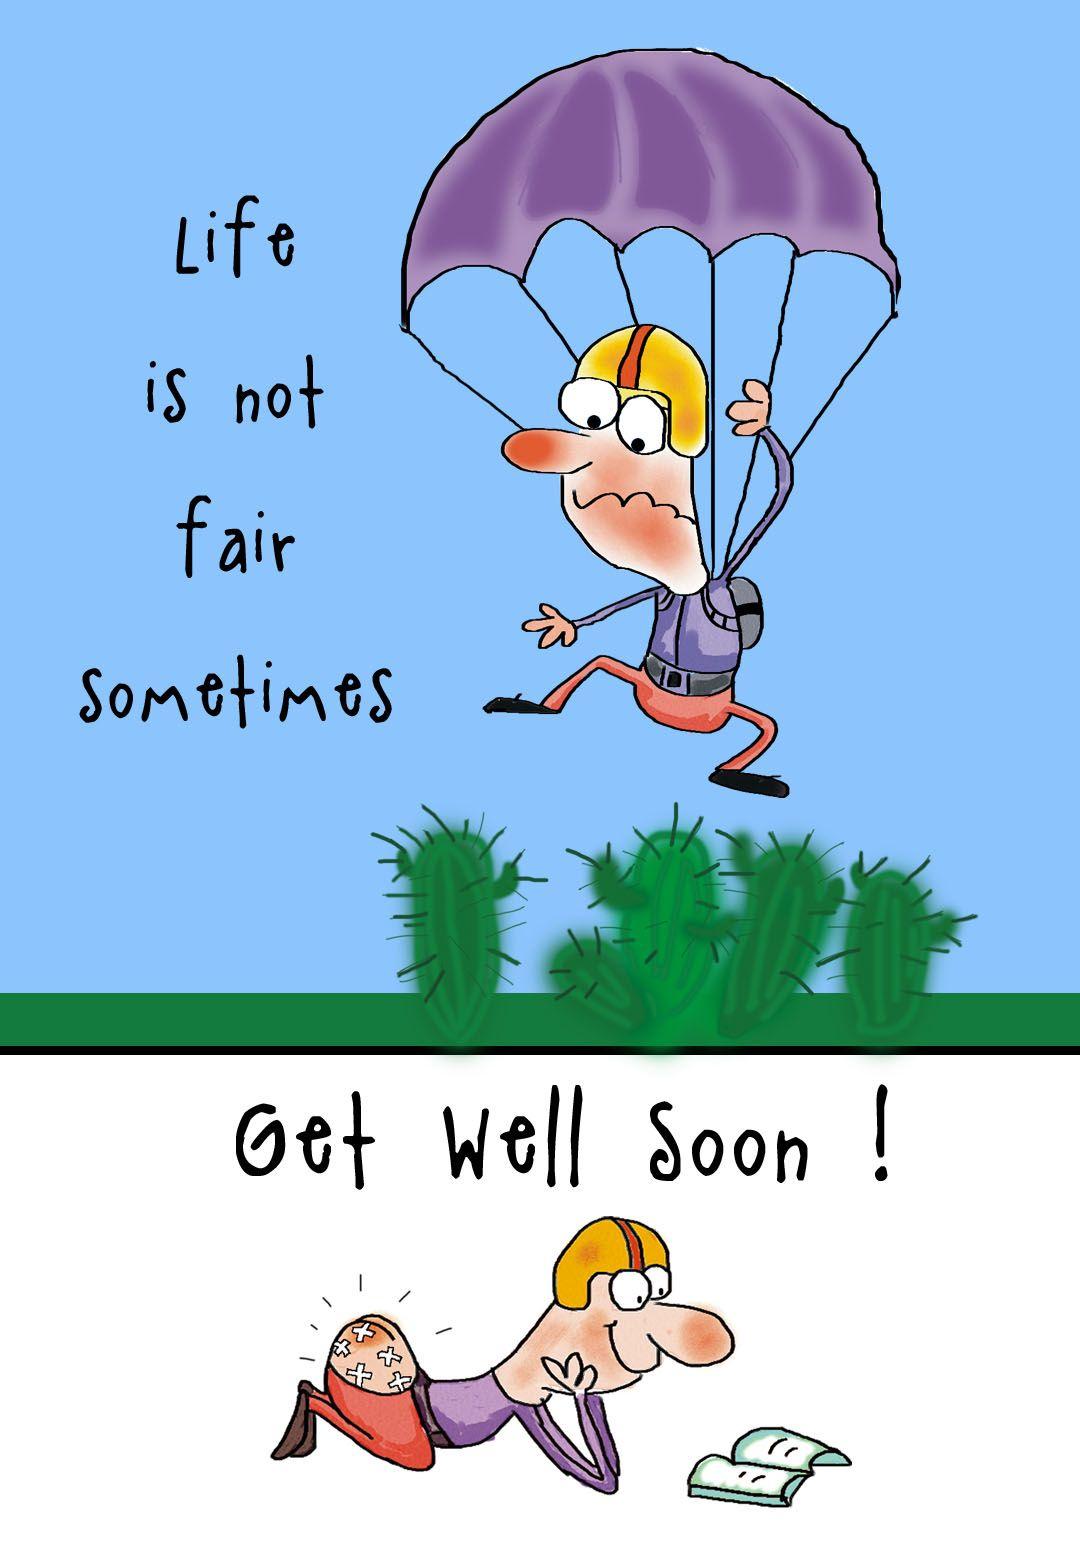 Free Printable Get Well Soon Greeting Card | Just Cute! - Free Printable Get Well Soon Cards